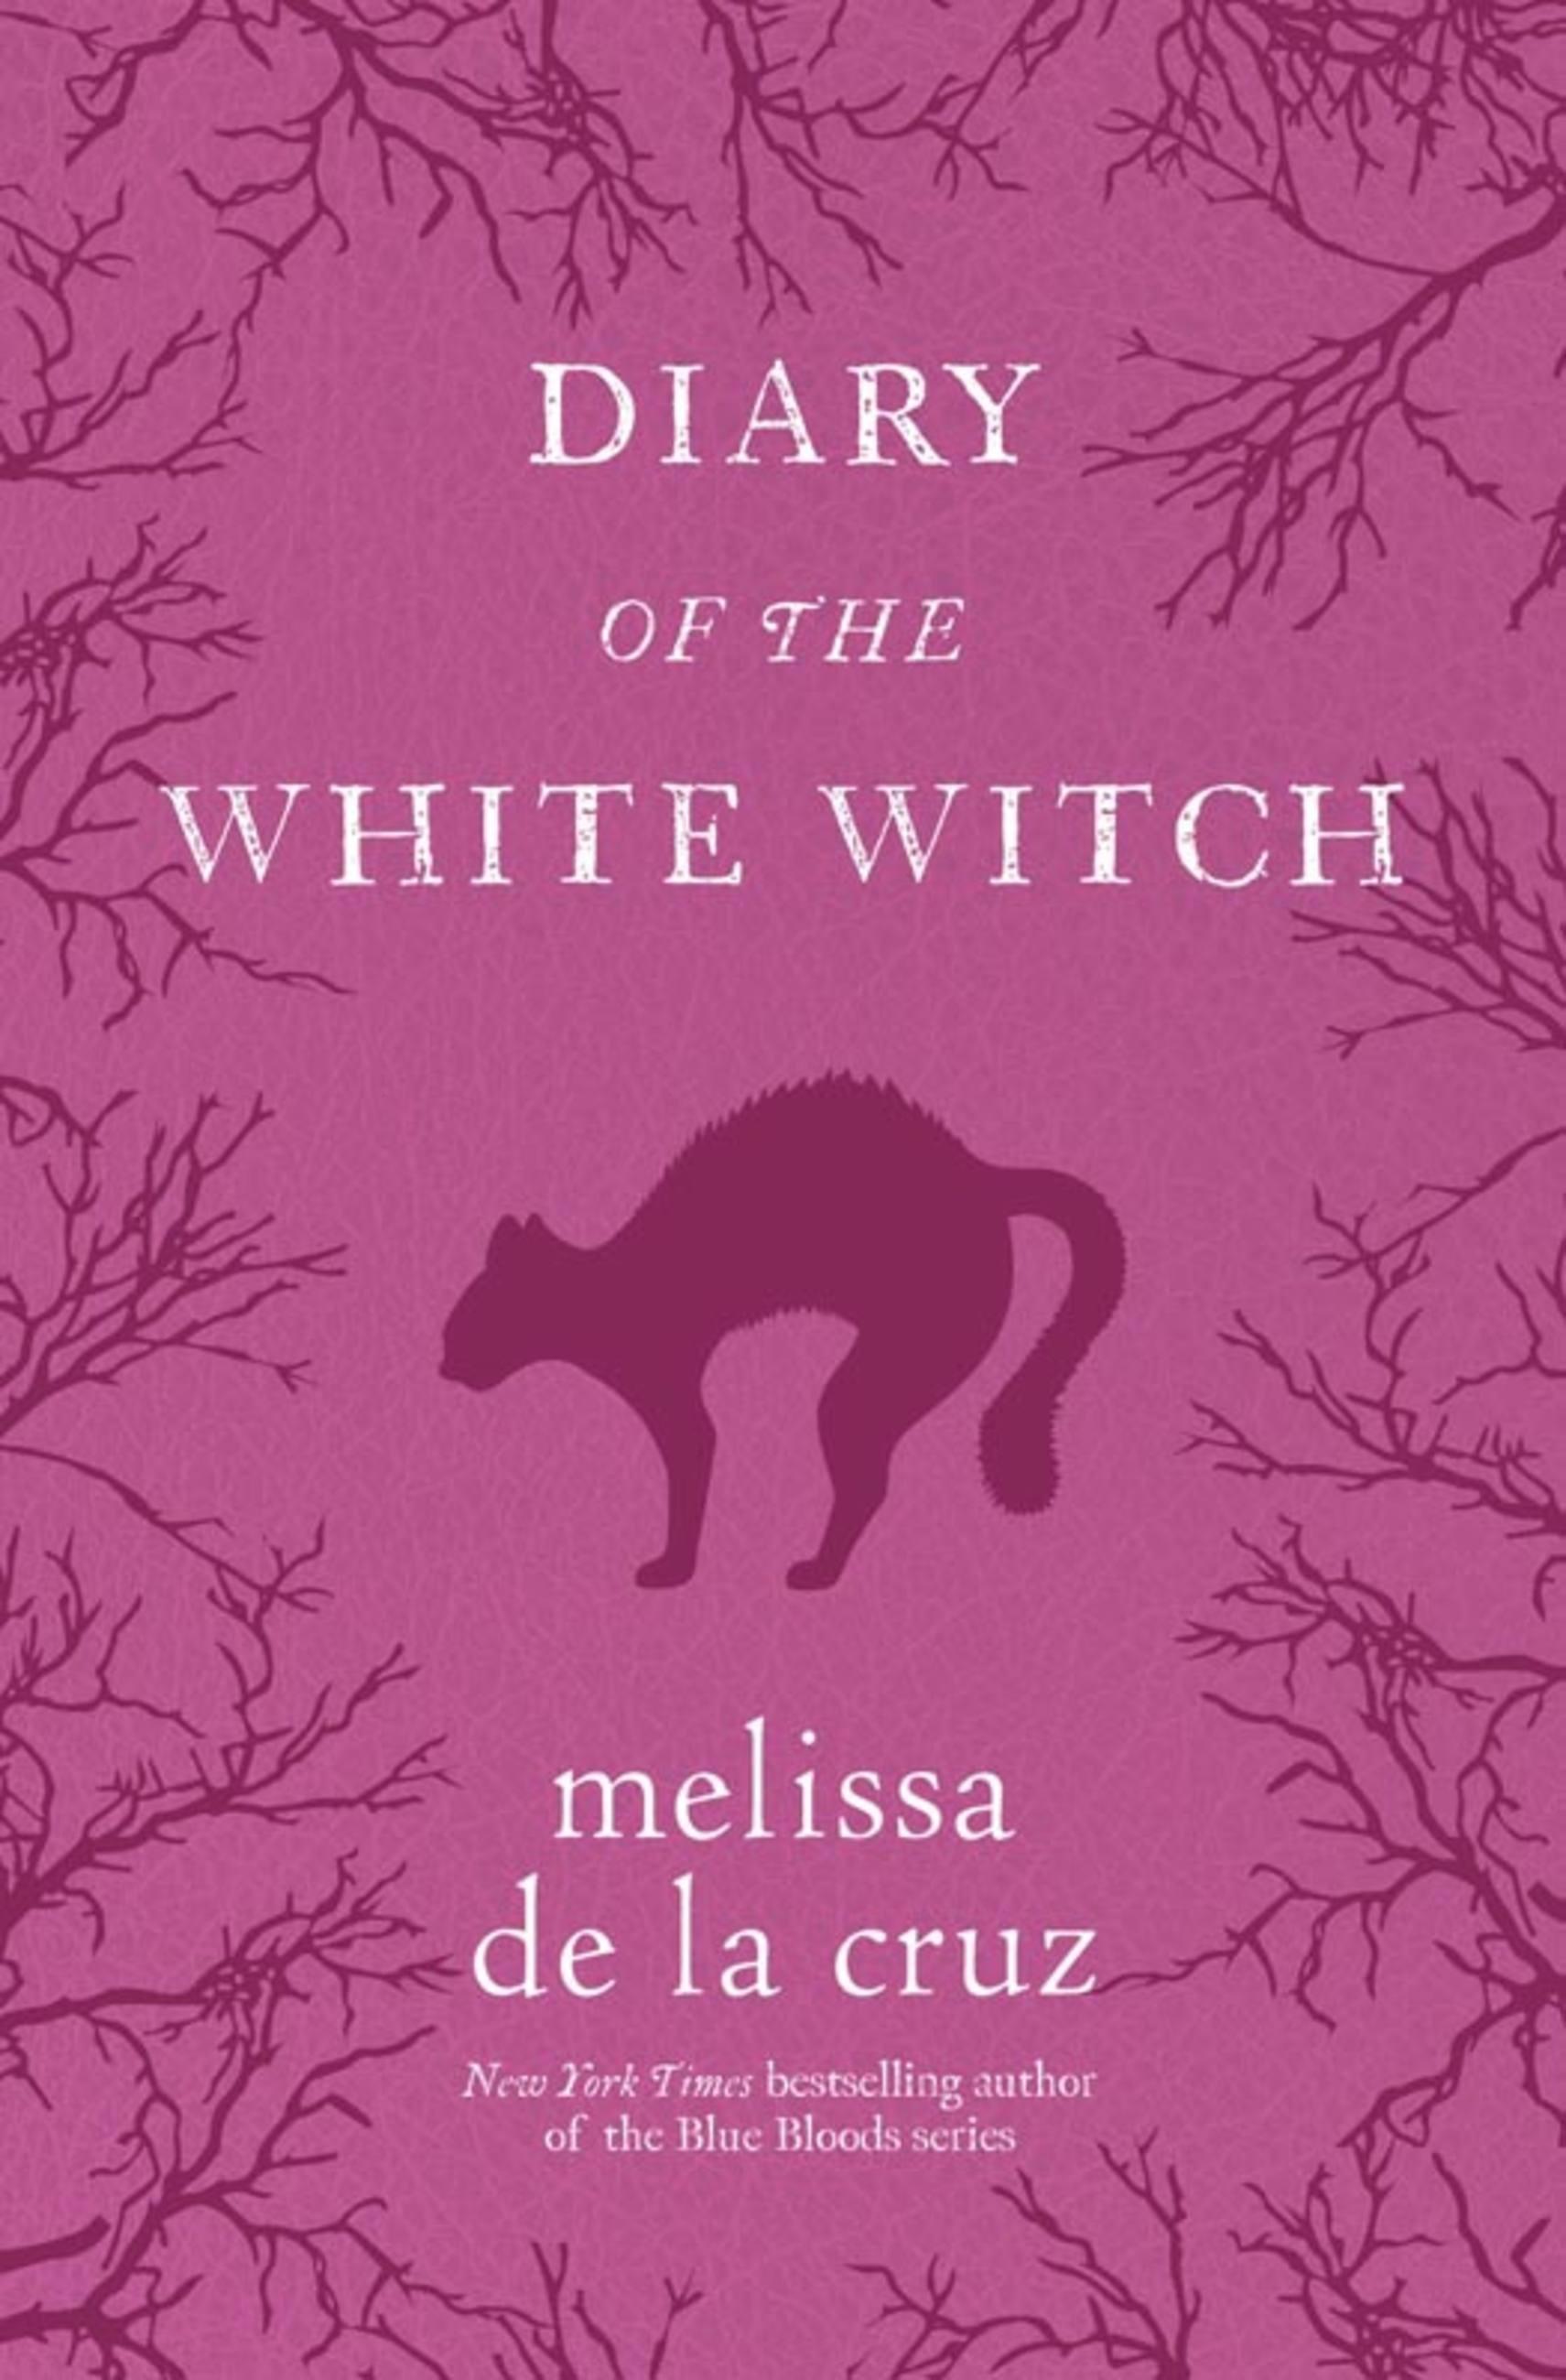 Diary Of The White Witch By Melissa De La Cruz Hachette Book Group